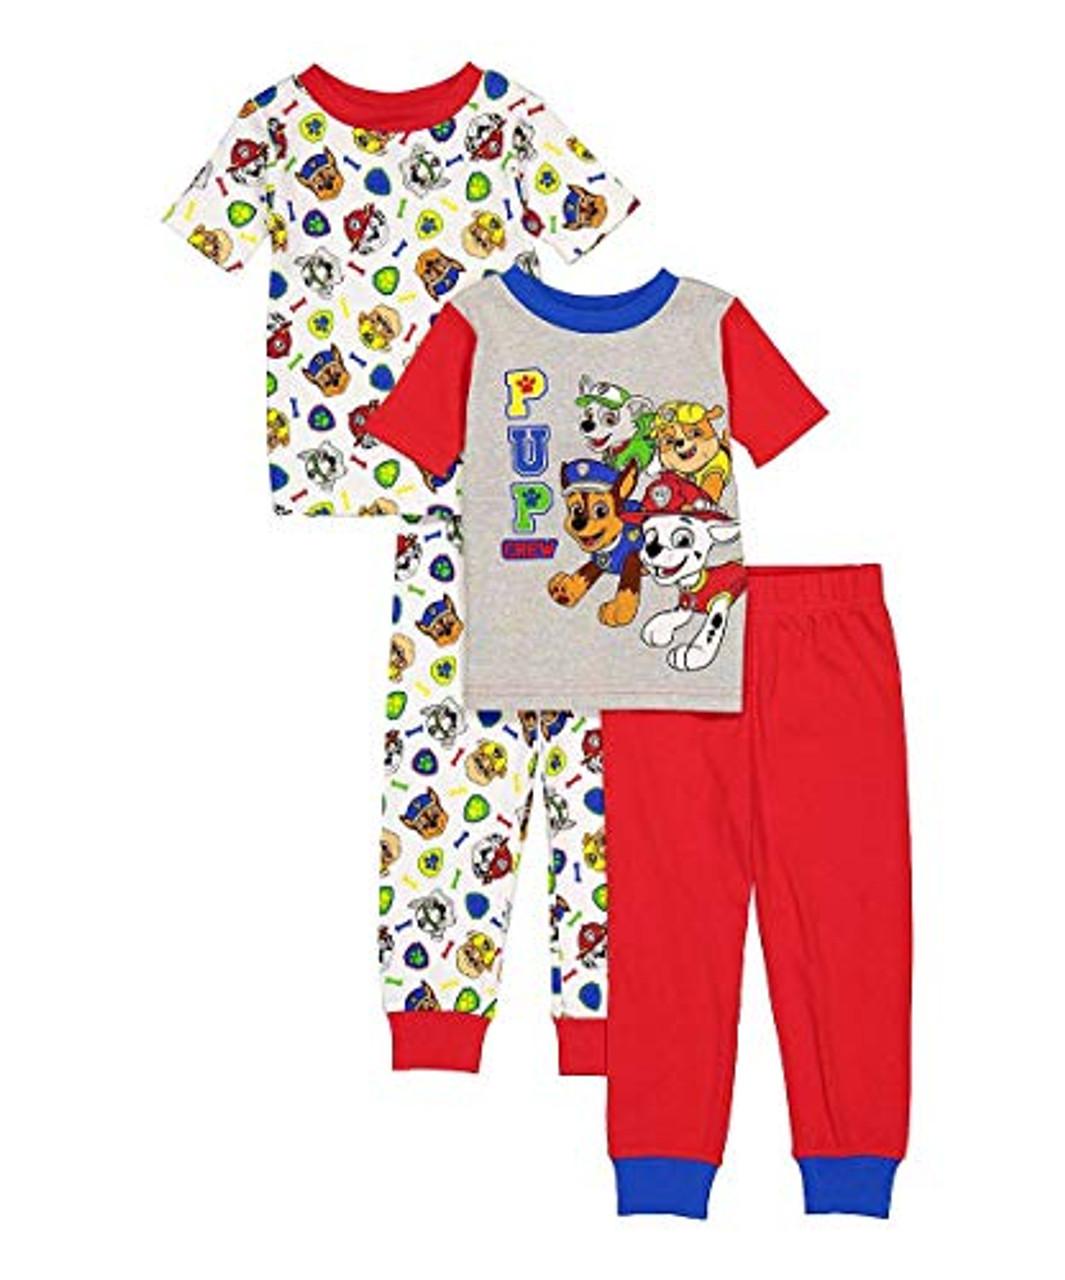 Paw Patrol Toddler Boy Ready for Action Shirt /& Shorts Pajamas New 4T